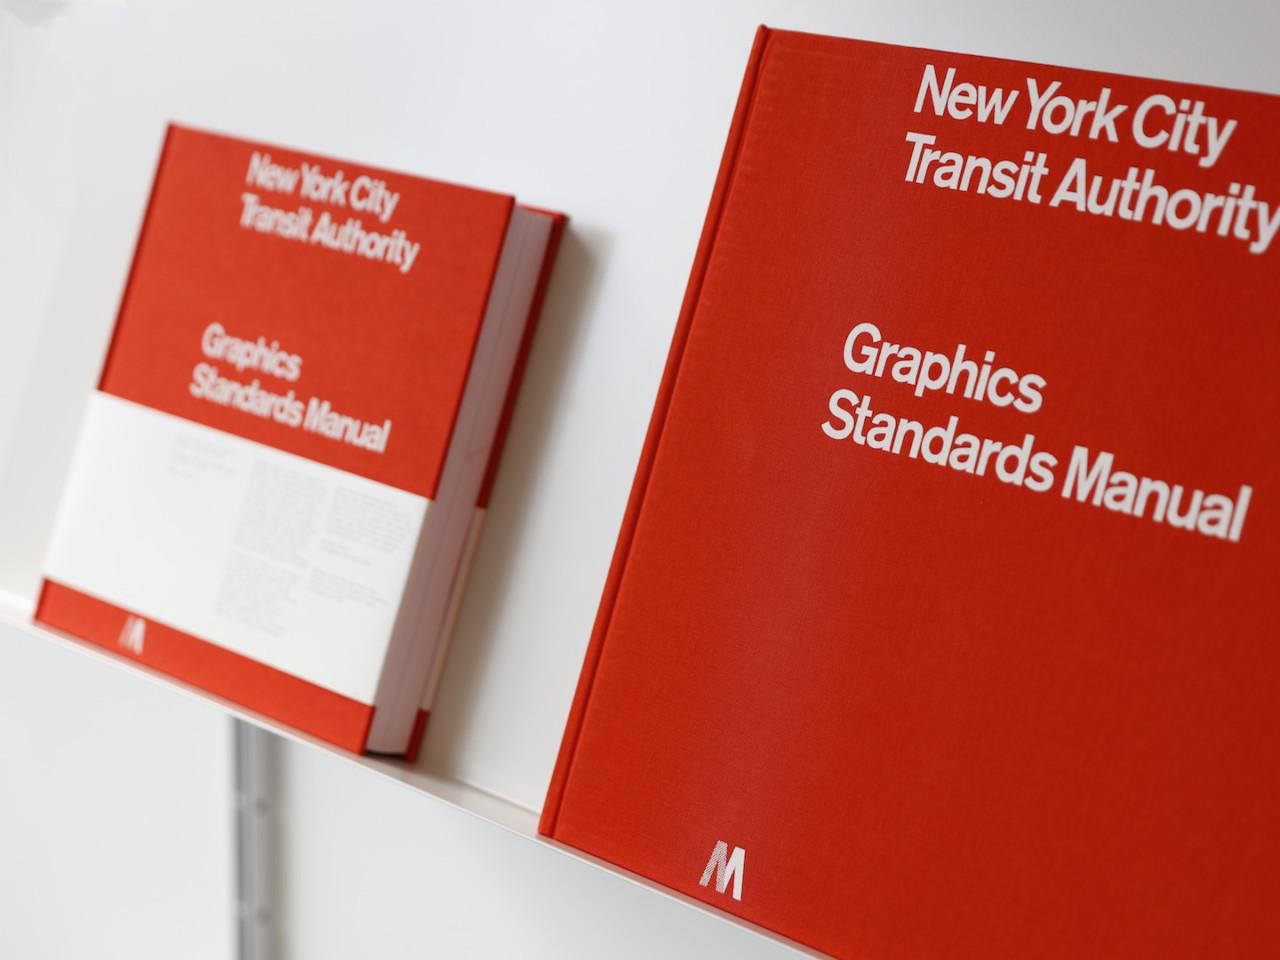 leibal_standards-manual-bookstore_standards-manual_9.jpg